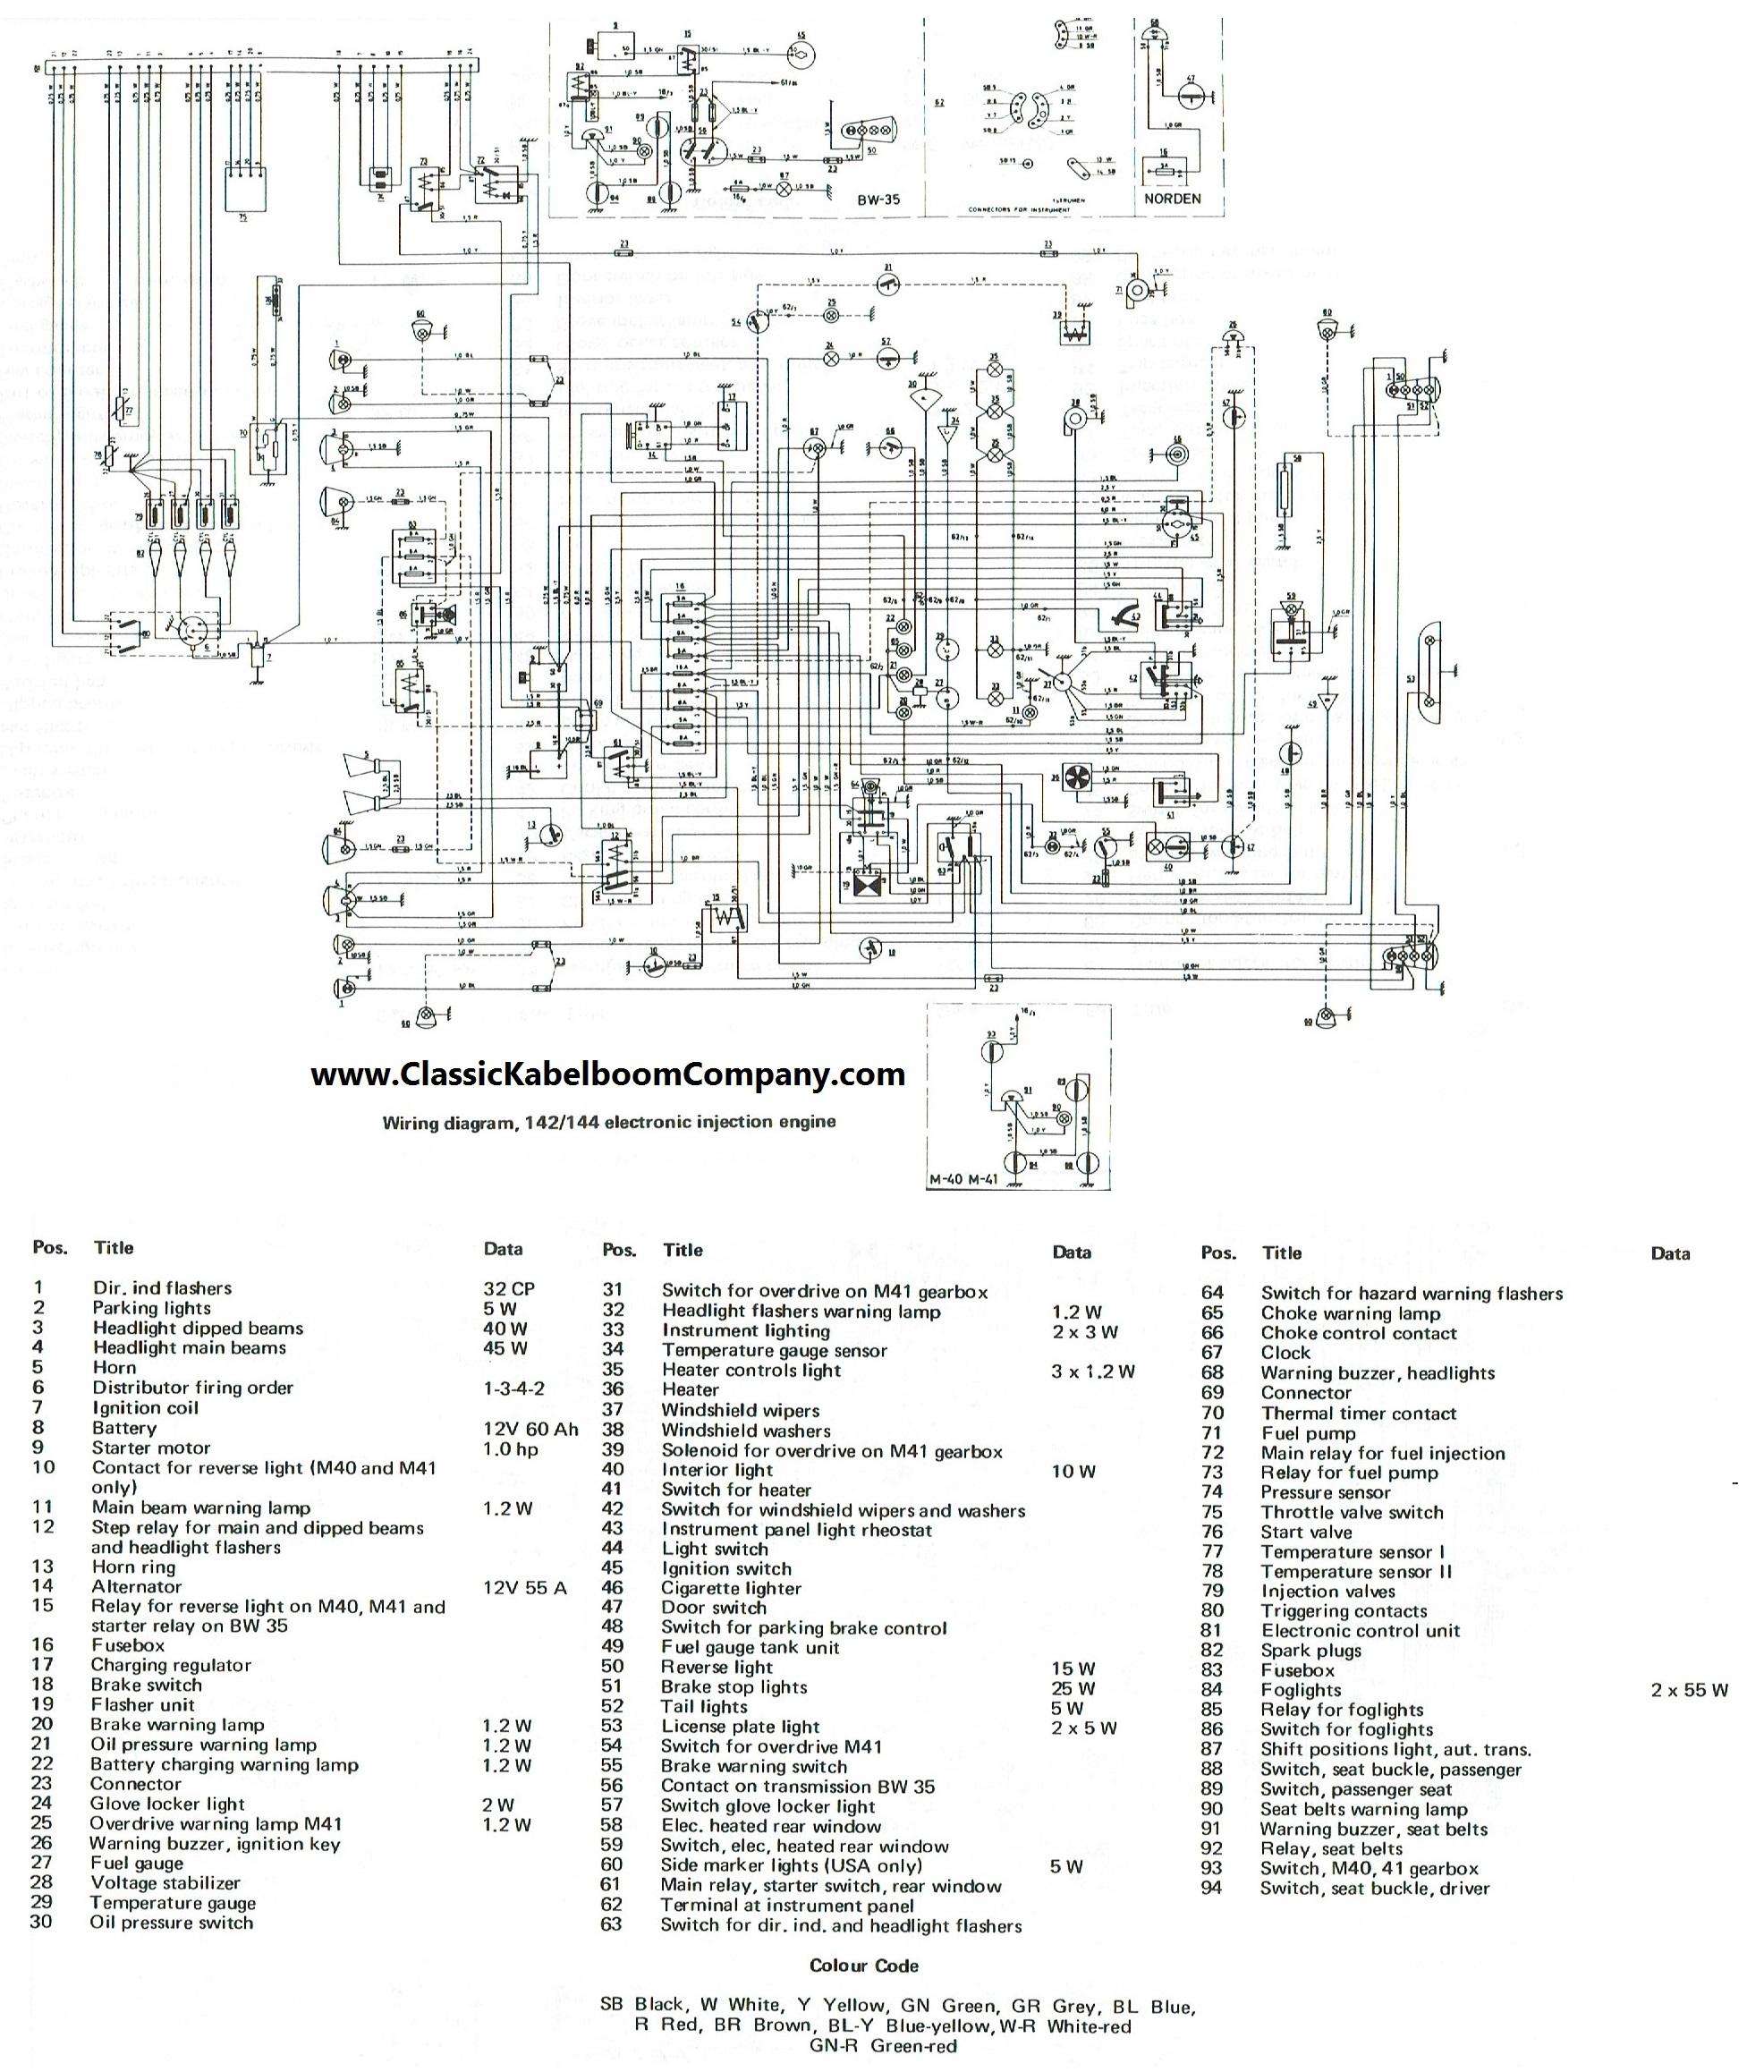 classic kabelboom company elektrisch bedrading schema volvo volvo 140 142 144 145 1971 1972 d jetronic fuel injection injectie b20e e electrical wiring diagram elektrisch bedrading schema